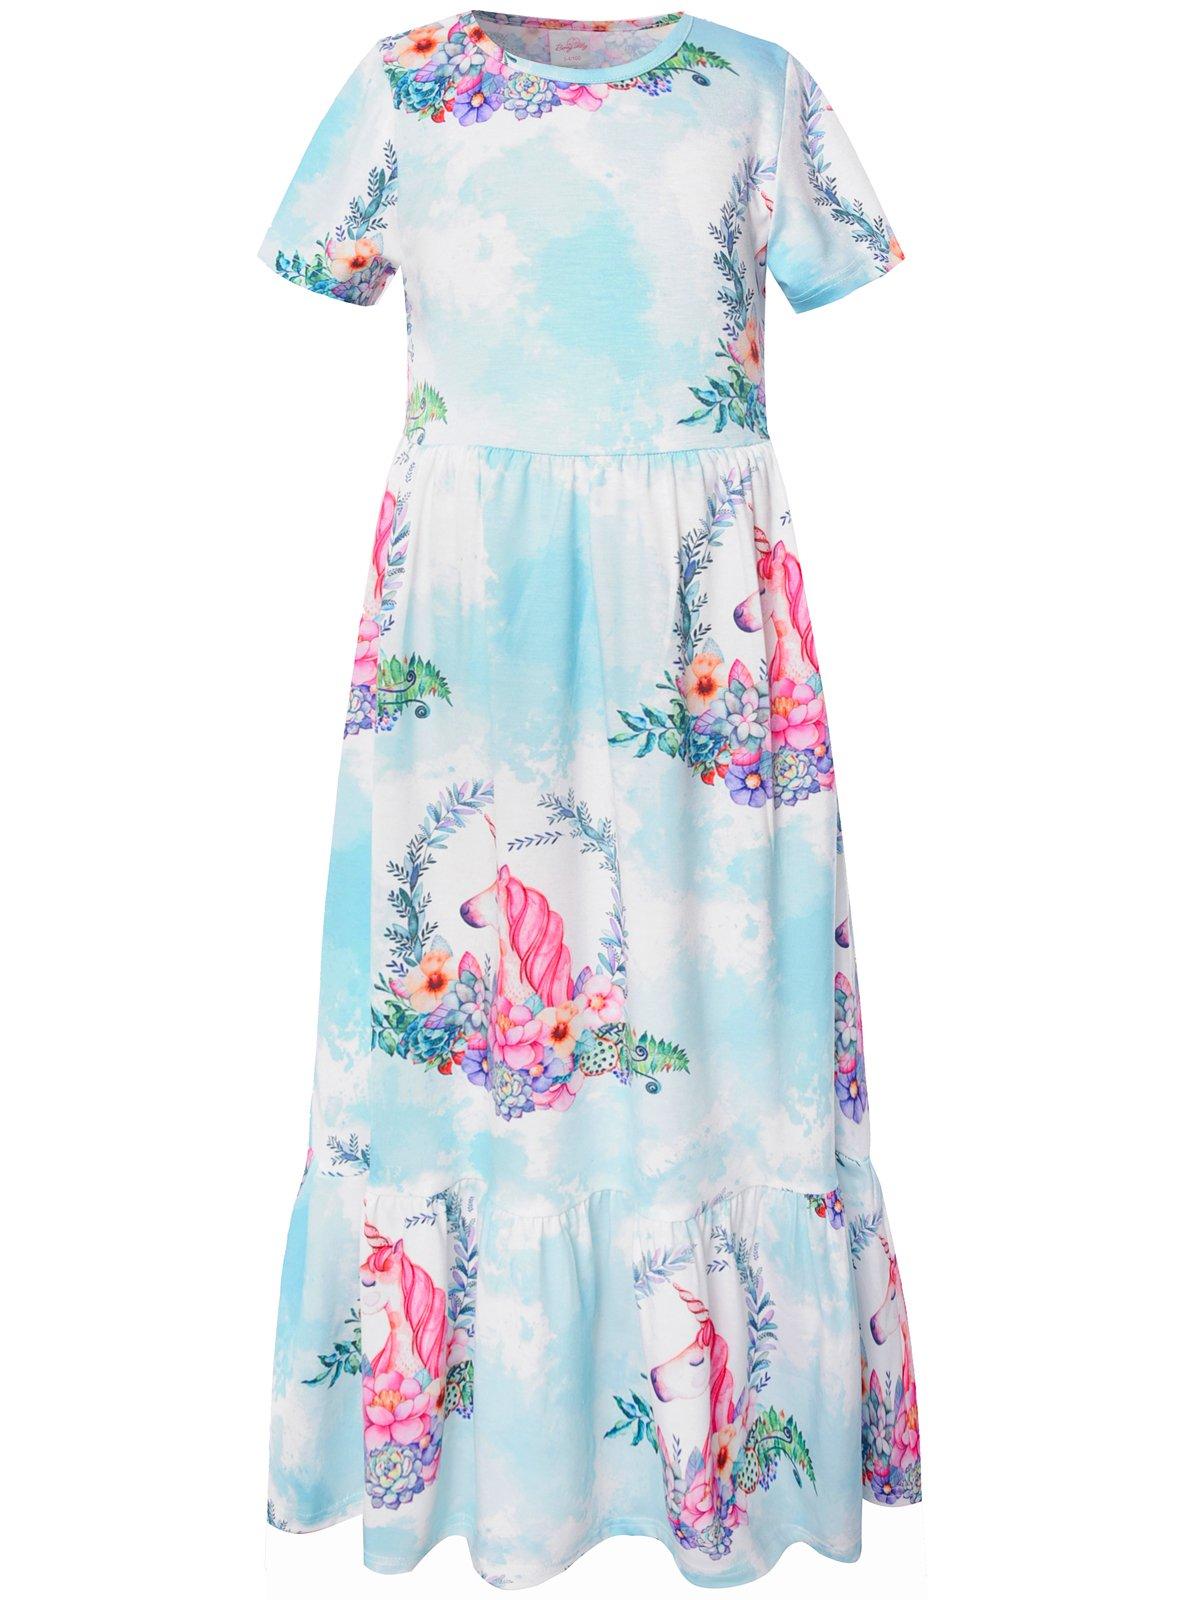 Bonny Billy Girls Dresses Summer Holiday Long Maxi Dress Size 7-8 Green